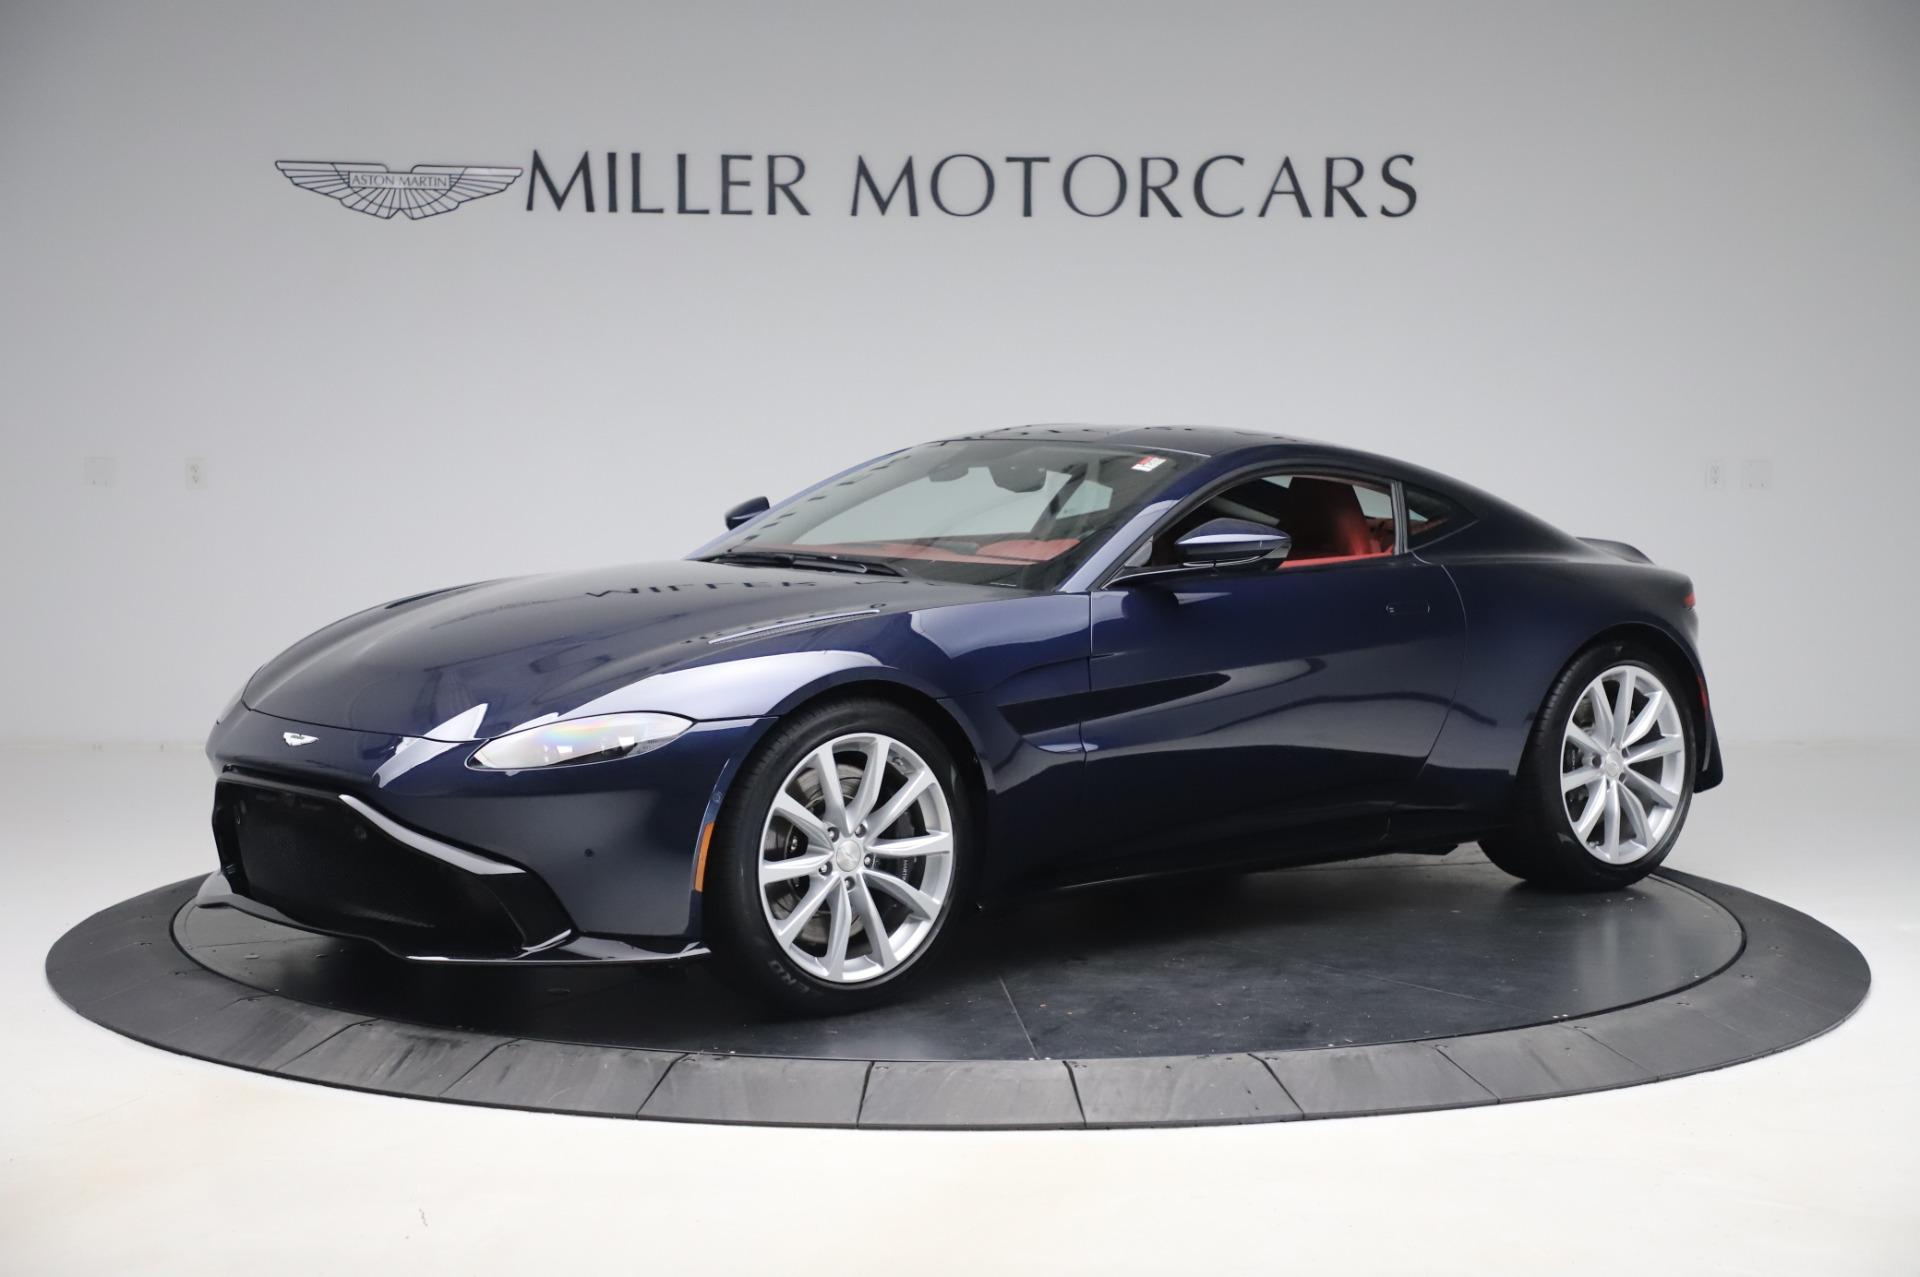 New 2020 Aston Martin Vantage for sale $177,481 at Maserati of Greenwich in Greenwich CT 06830 1